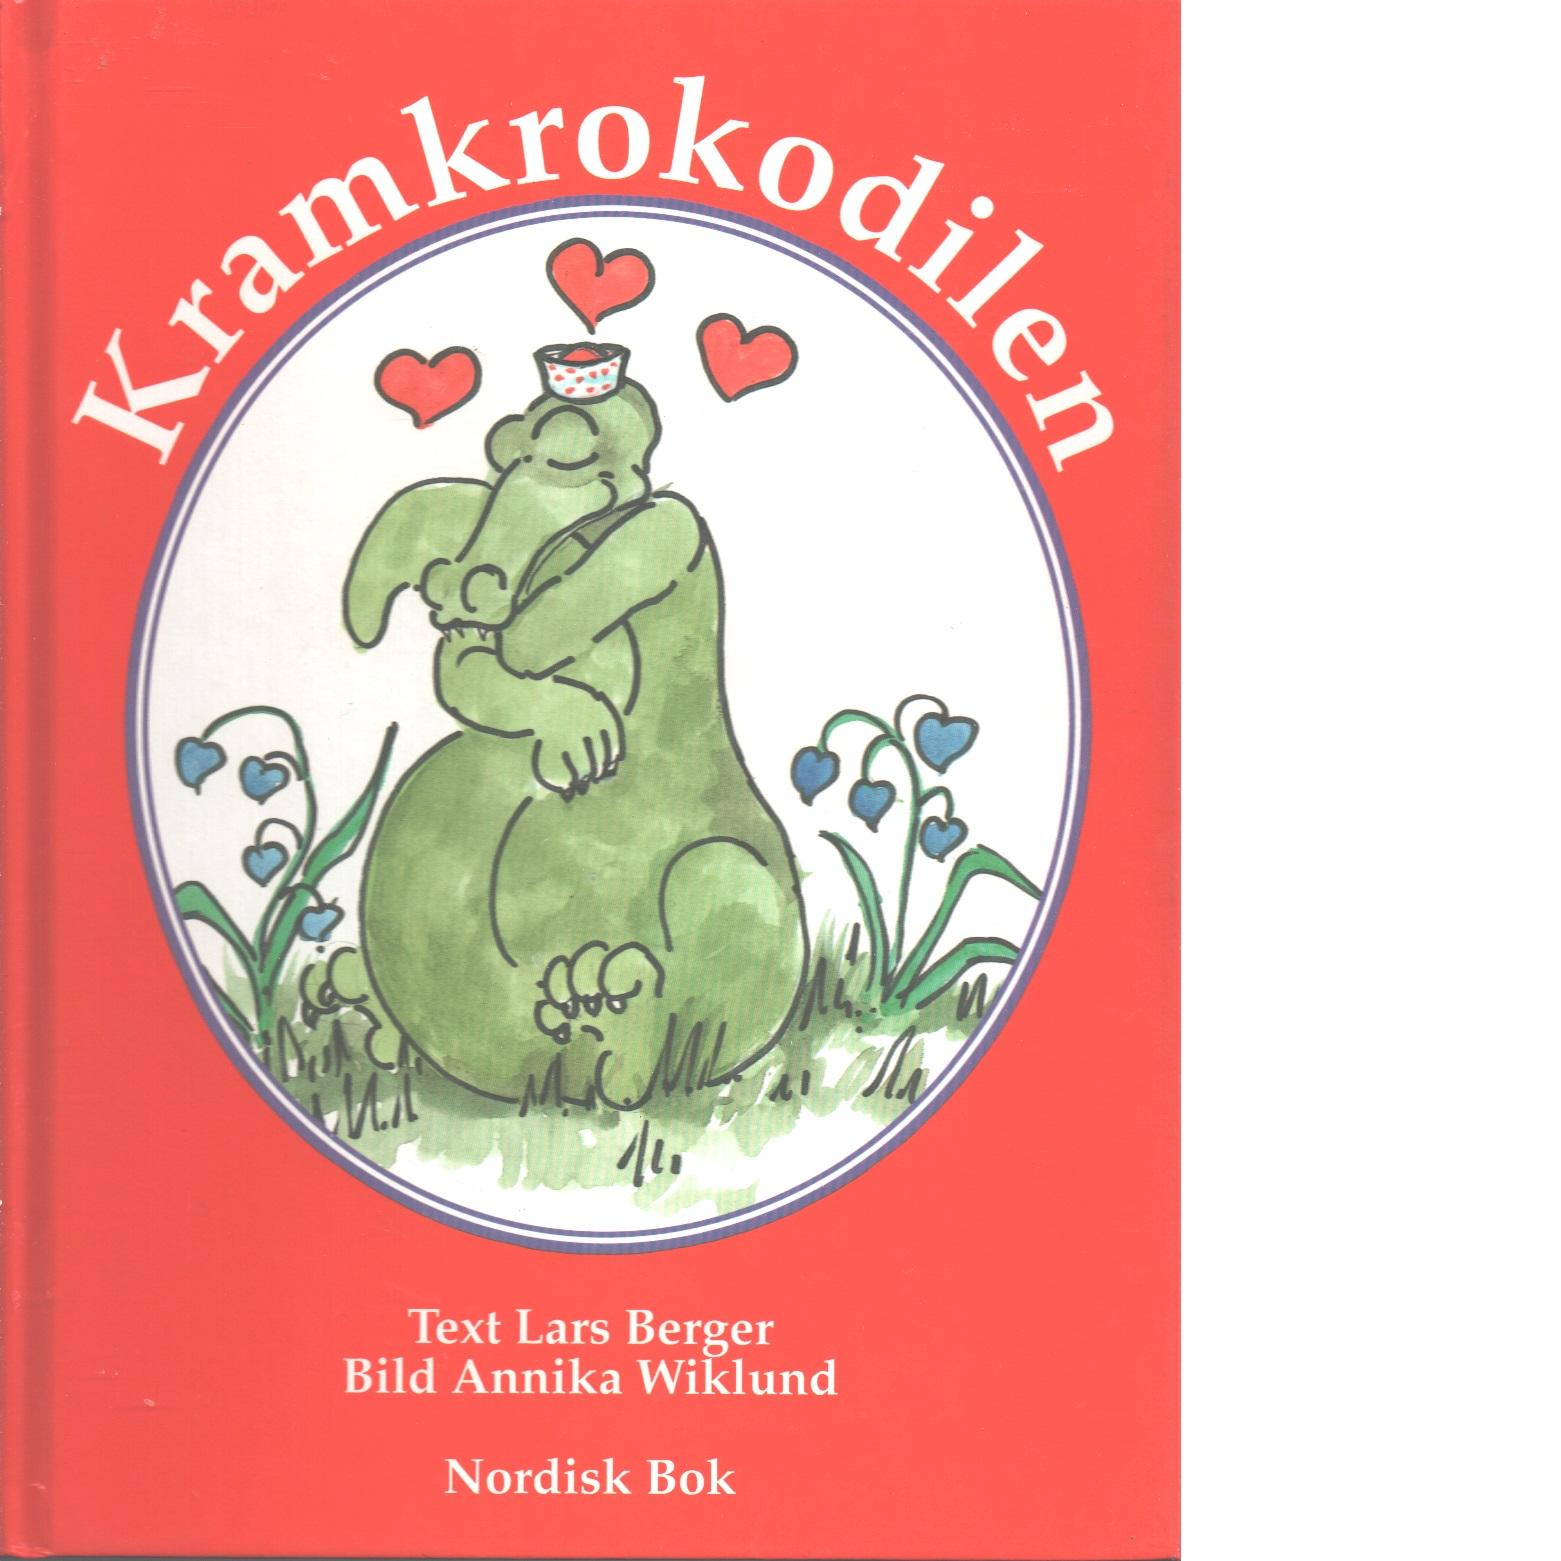 Kramkrokodilen - Berger, Lars